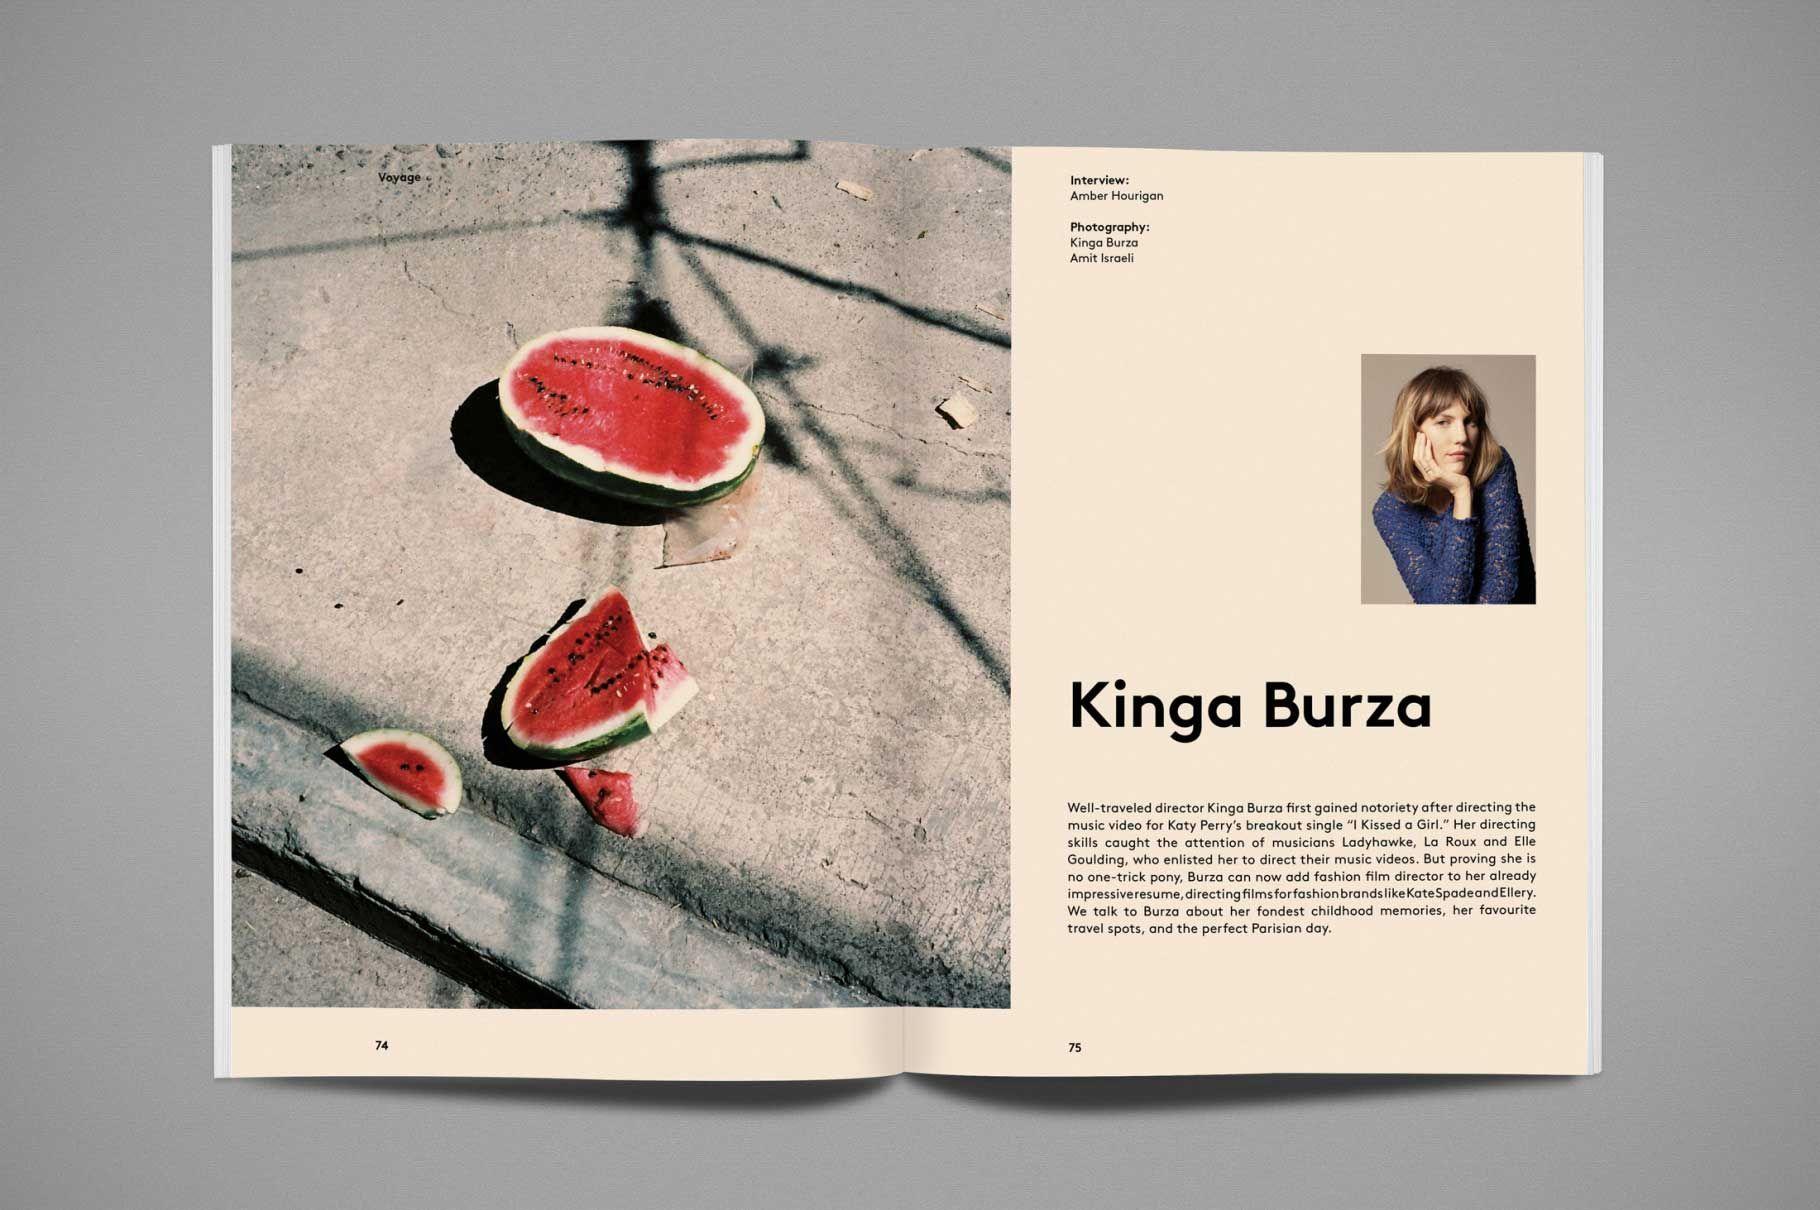 Kinga Burza